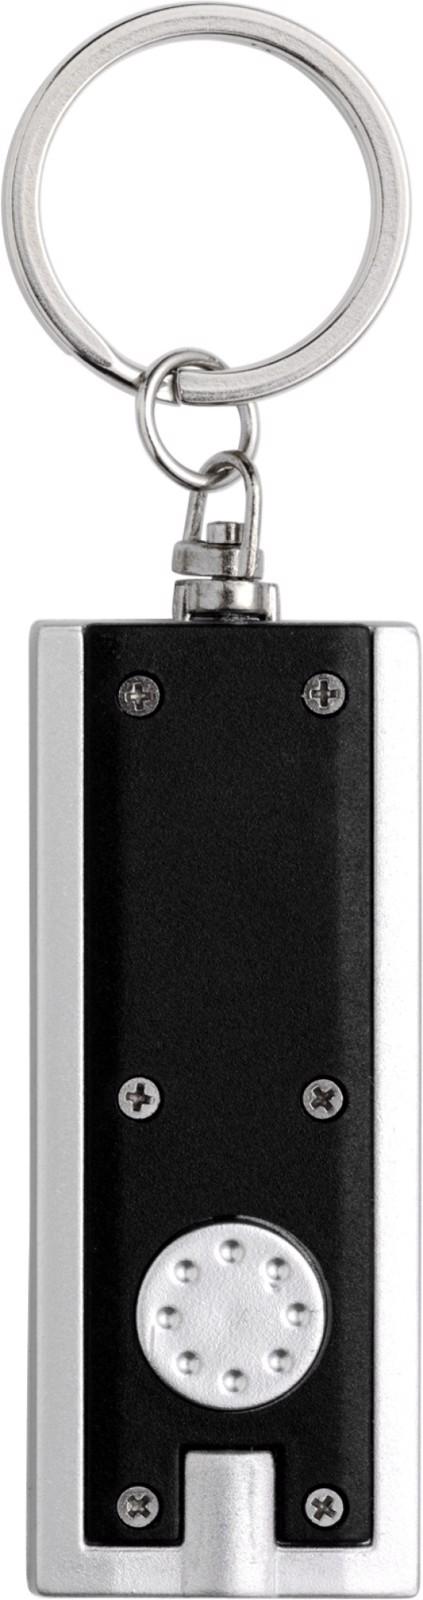 ABS key holder with LED - Black